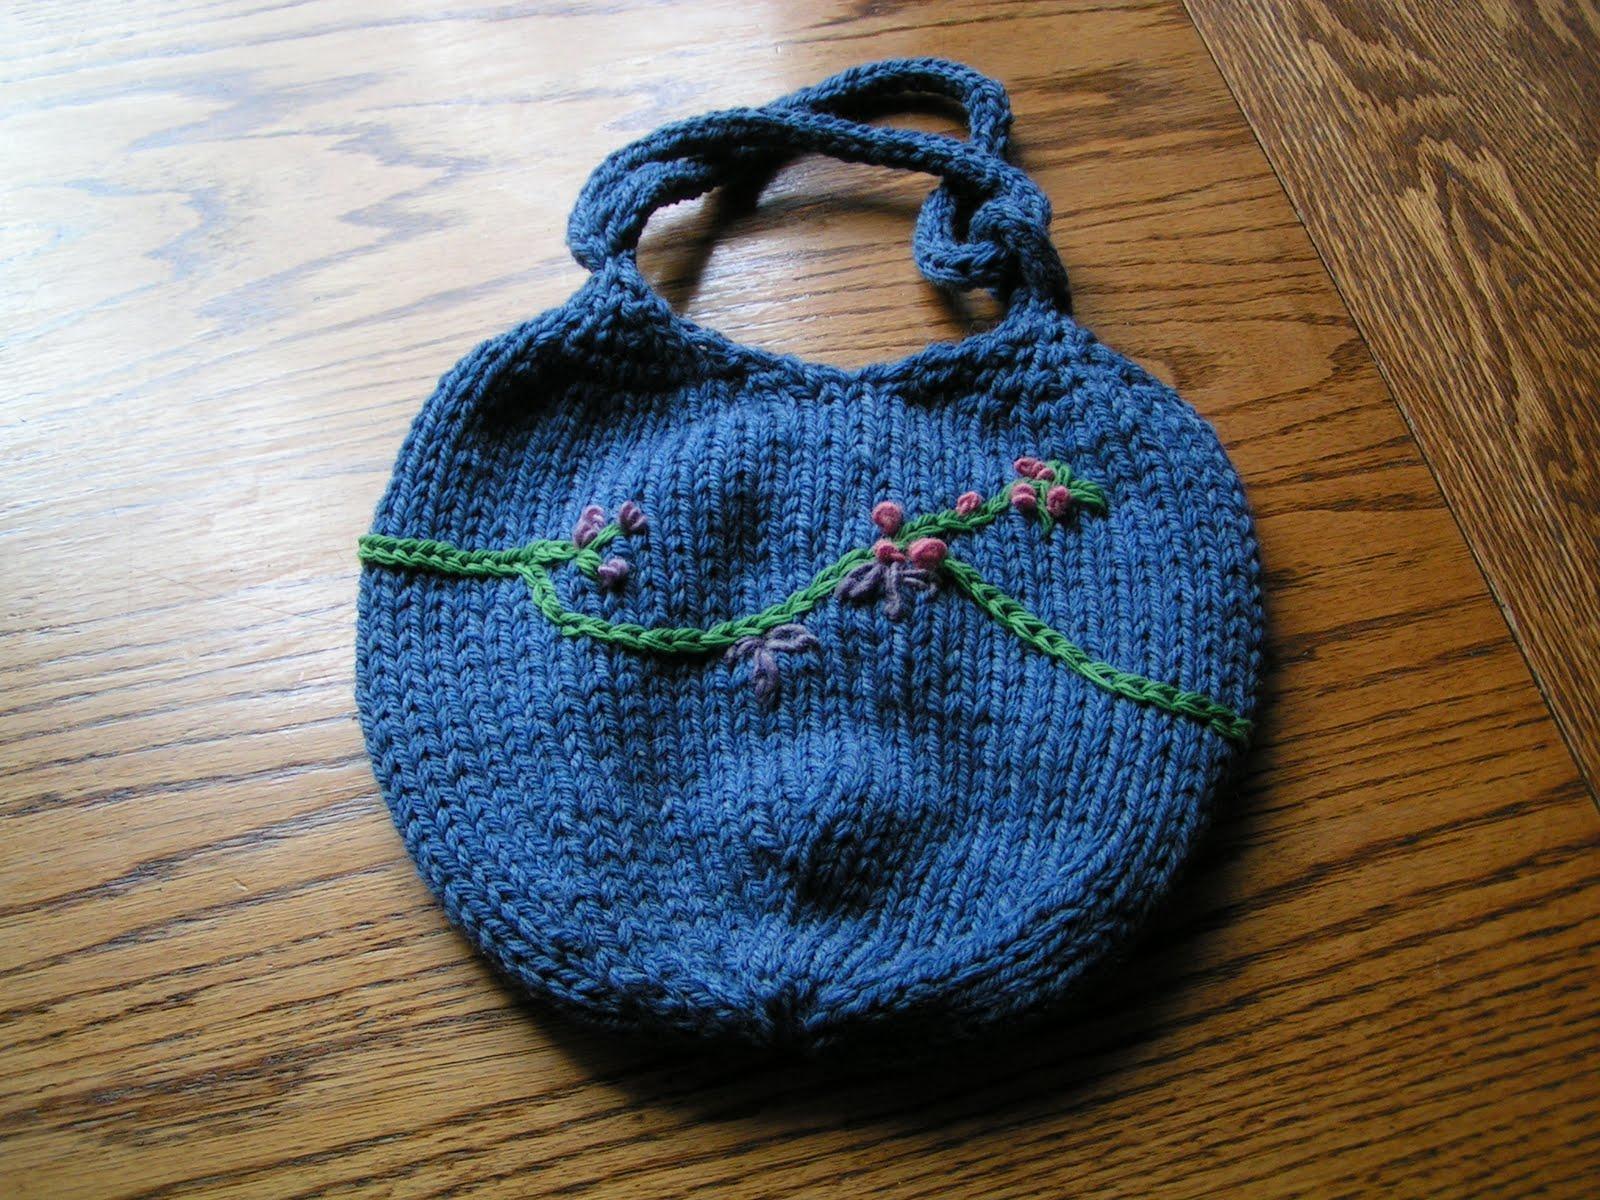 Dumpling Bag Knitting Pattern : A Piper Knits: Its a Dumpling Bag